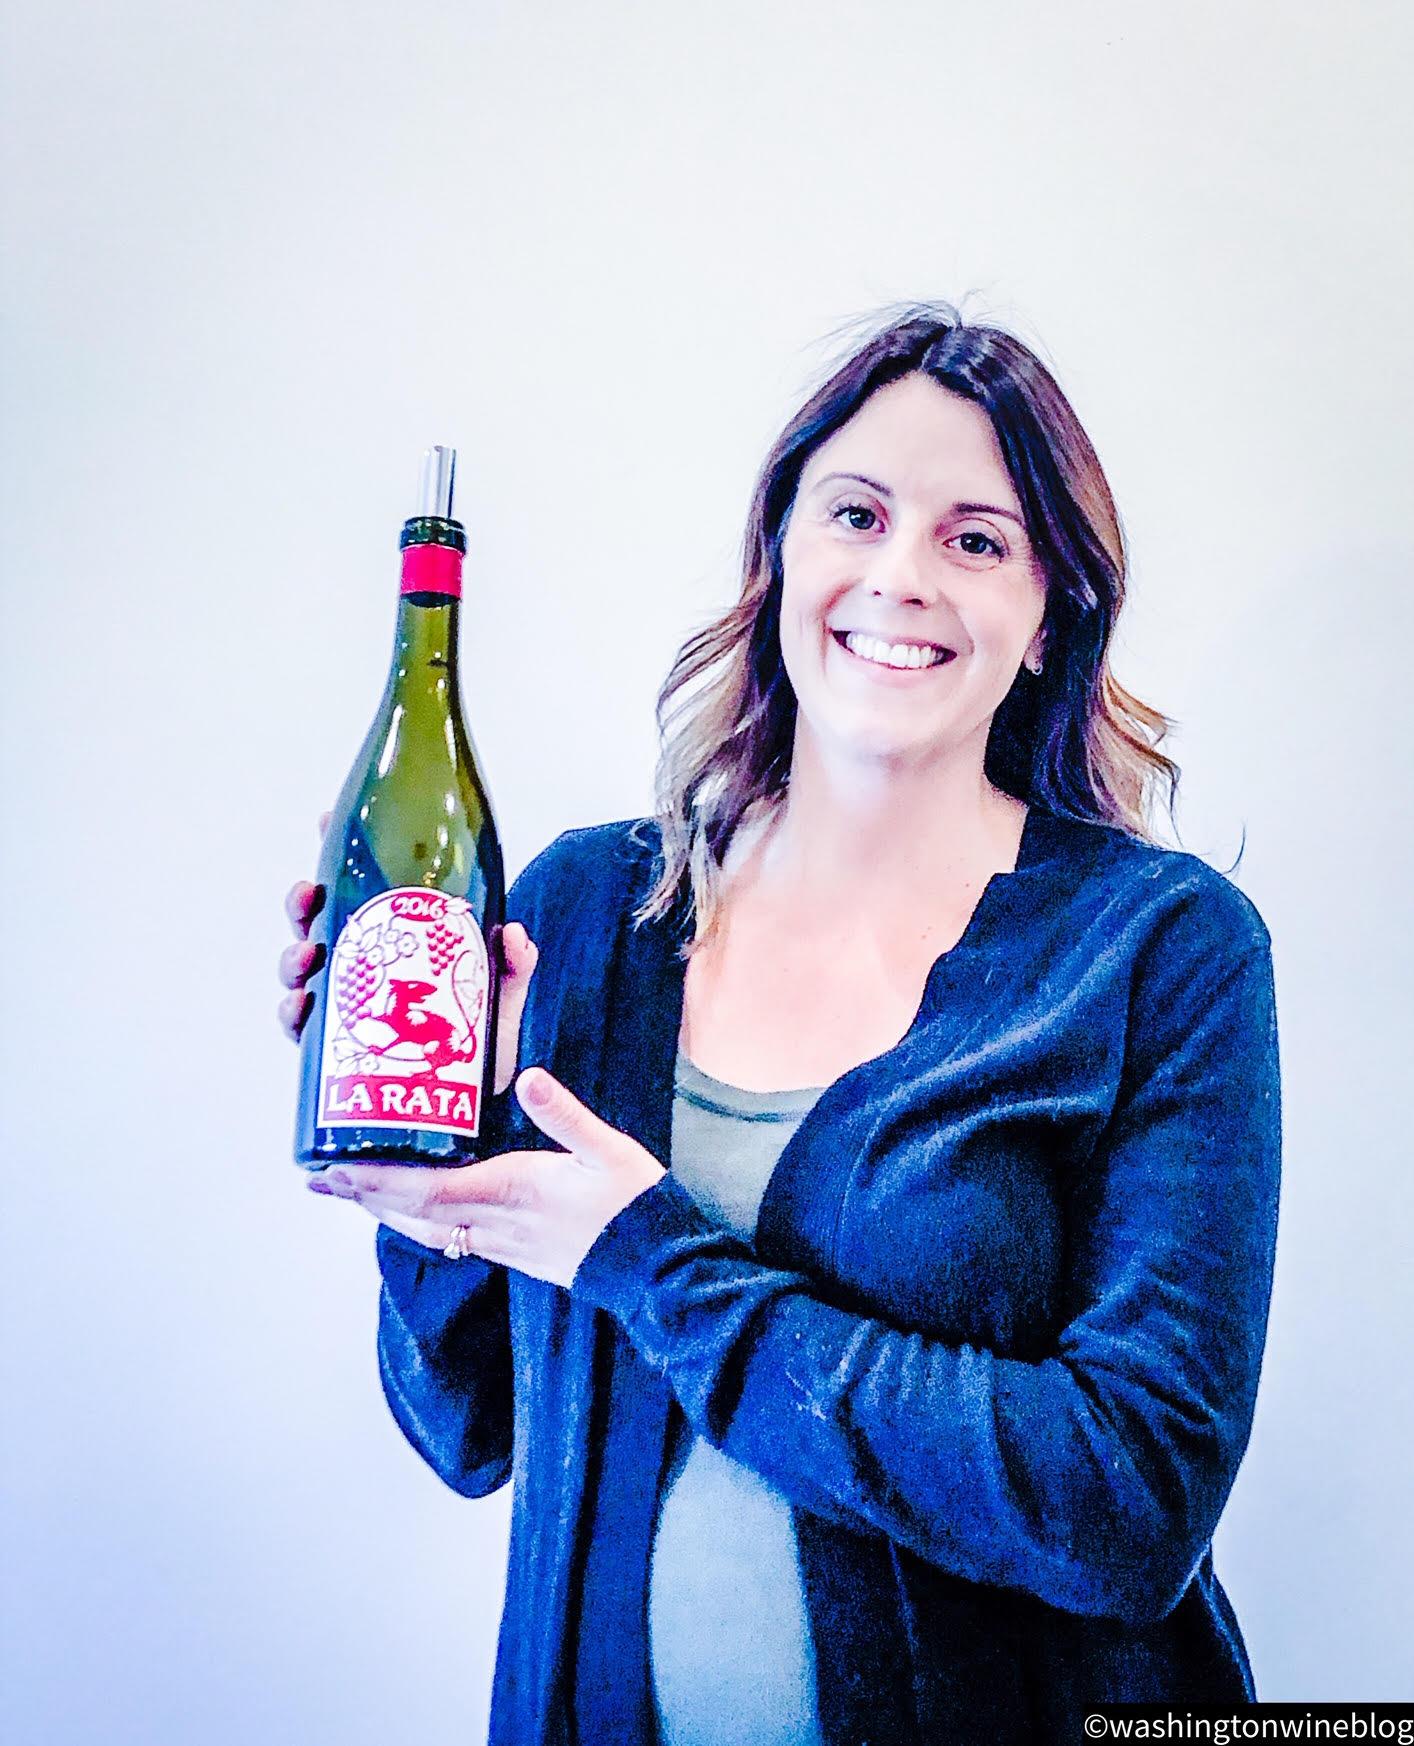 Superstar vigneronne Elizabeth Bourcier has crafted a stunning new wine, the 2016 La Rata Red Wine (WWB, 96).